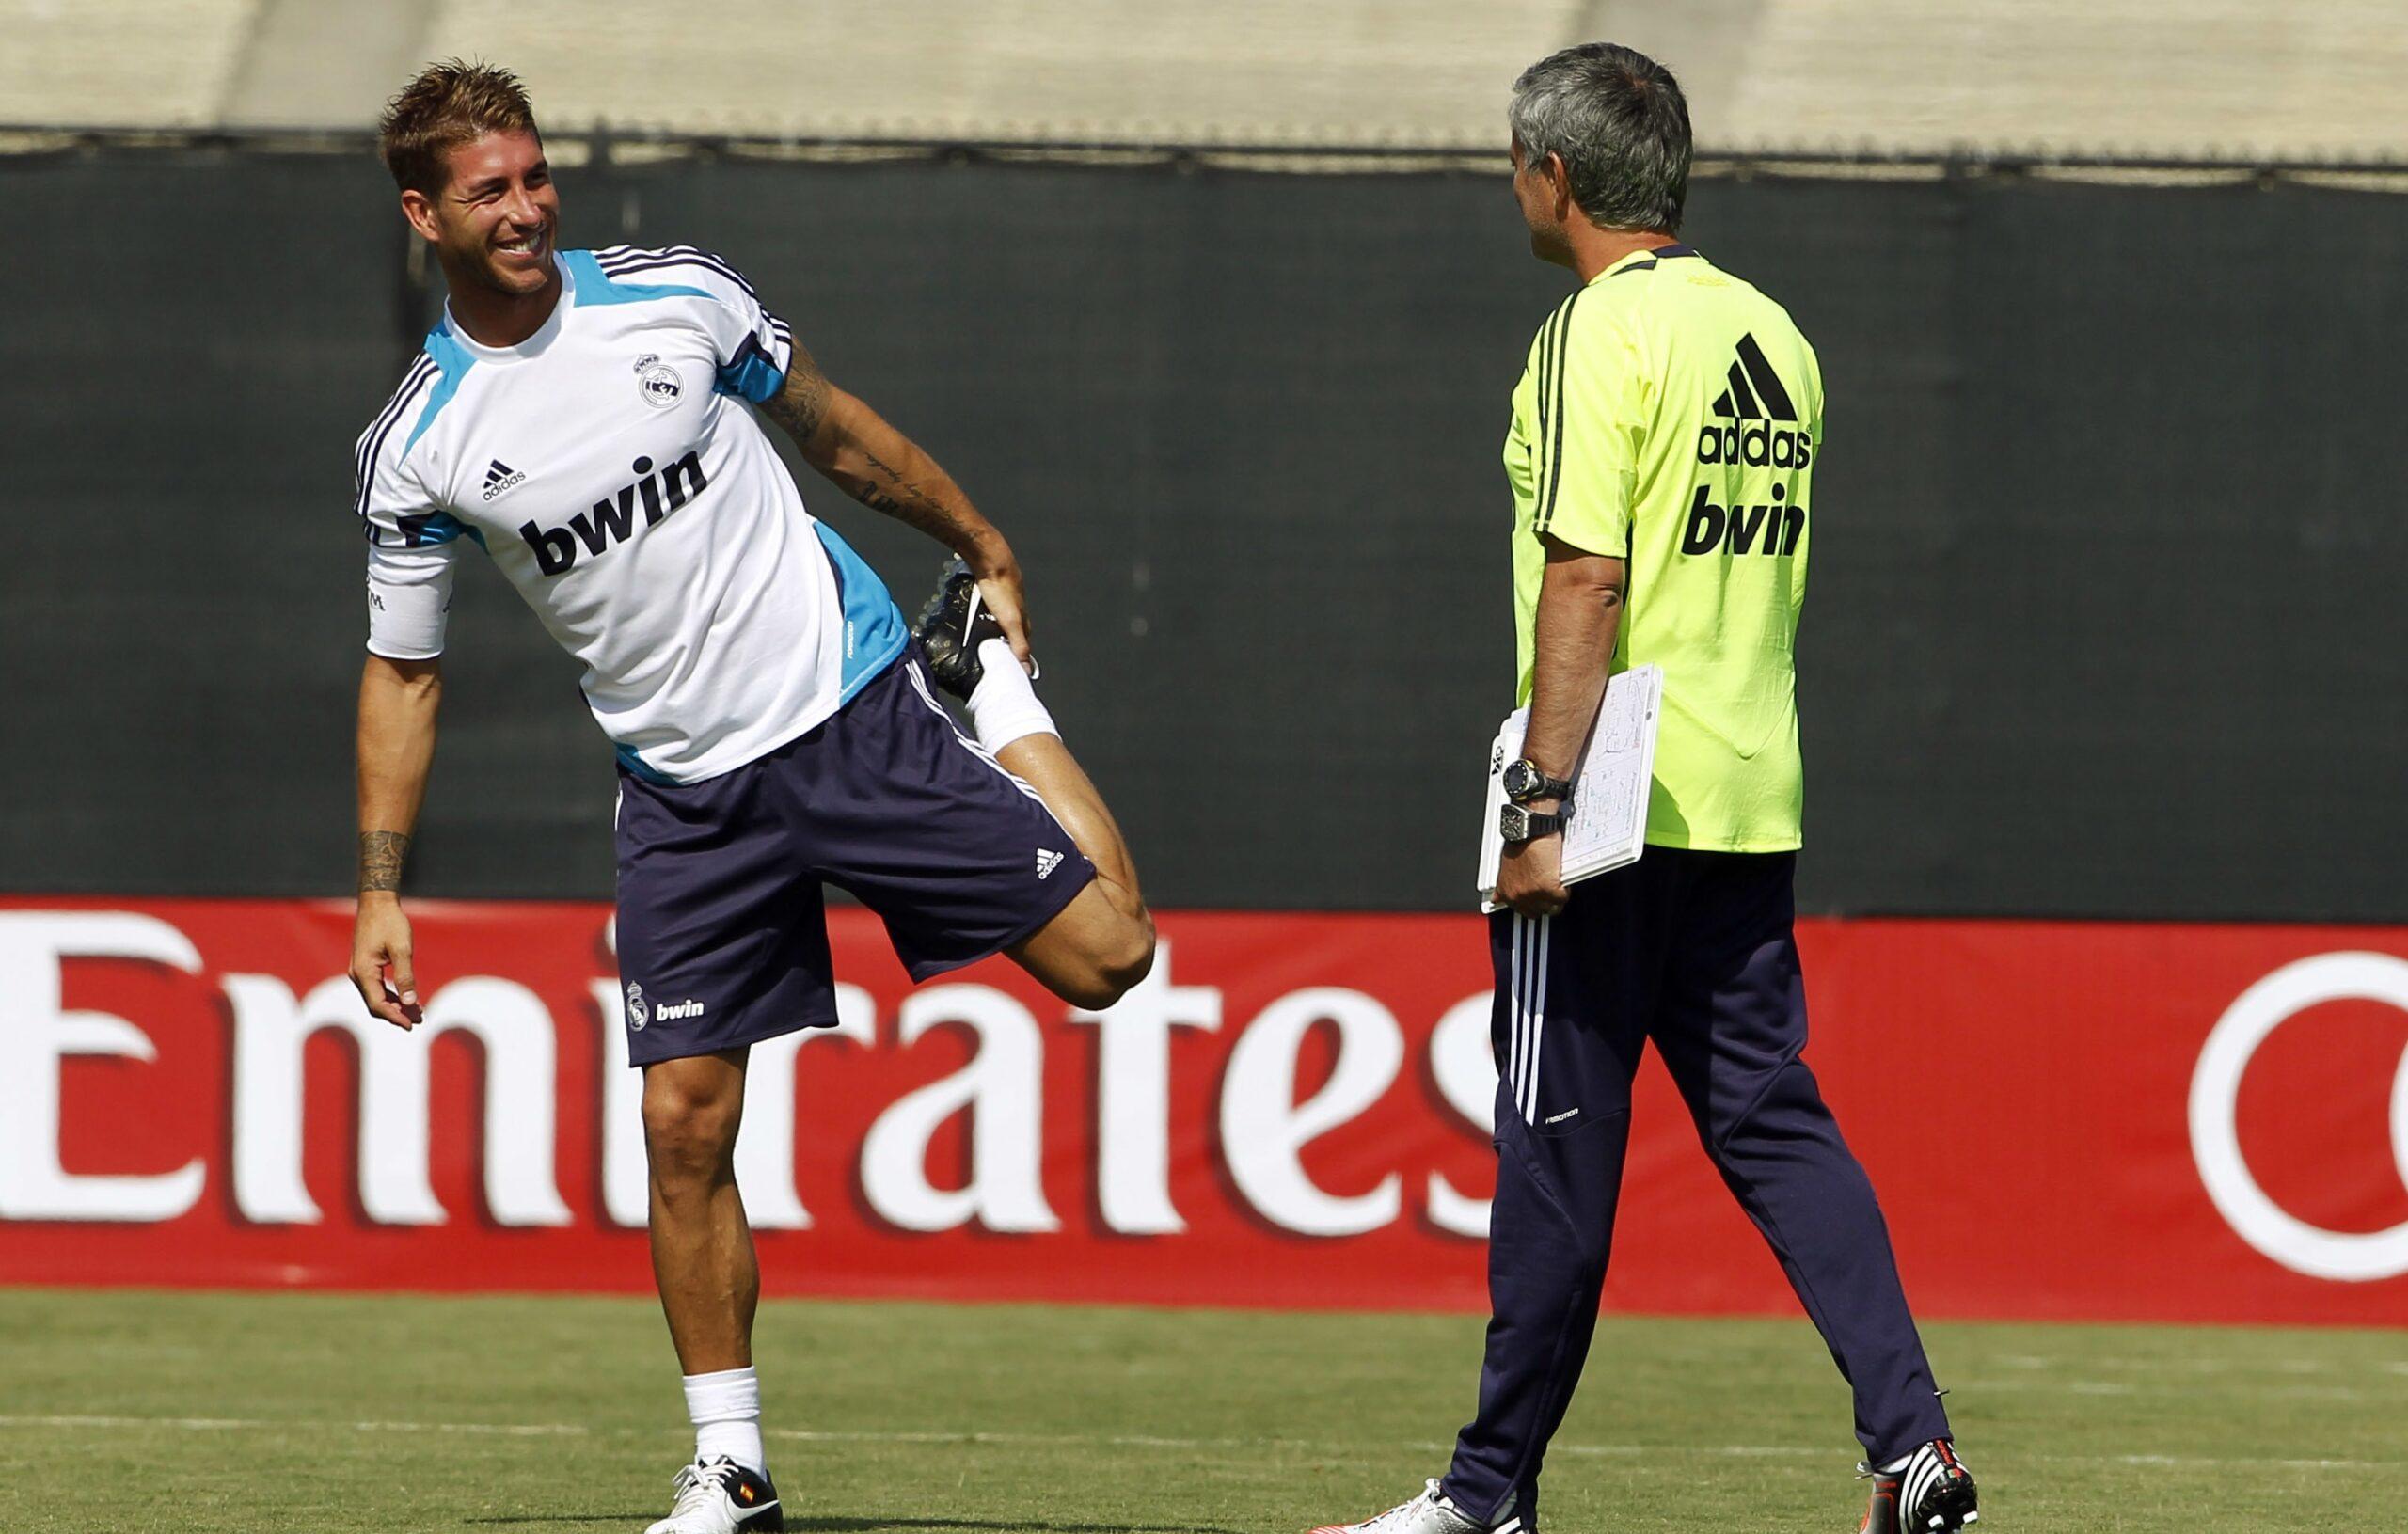 AS Roma, Mercato : Mourinho veut convaincre Sergio Ramos de le rejoindre en Italie